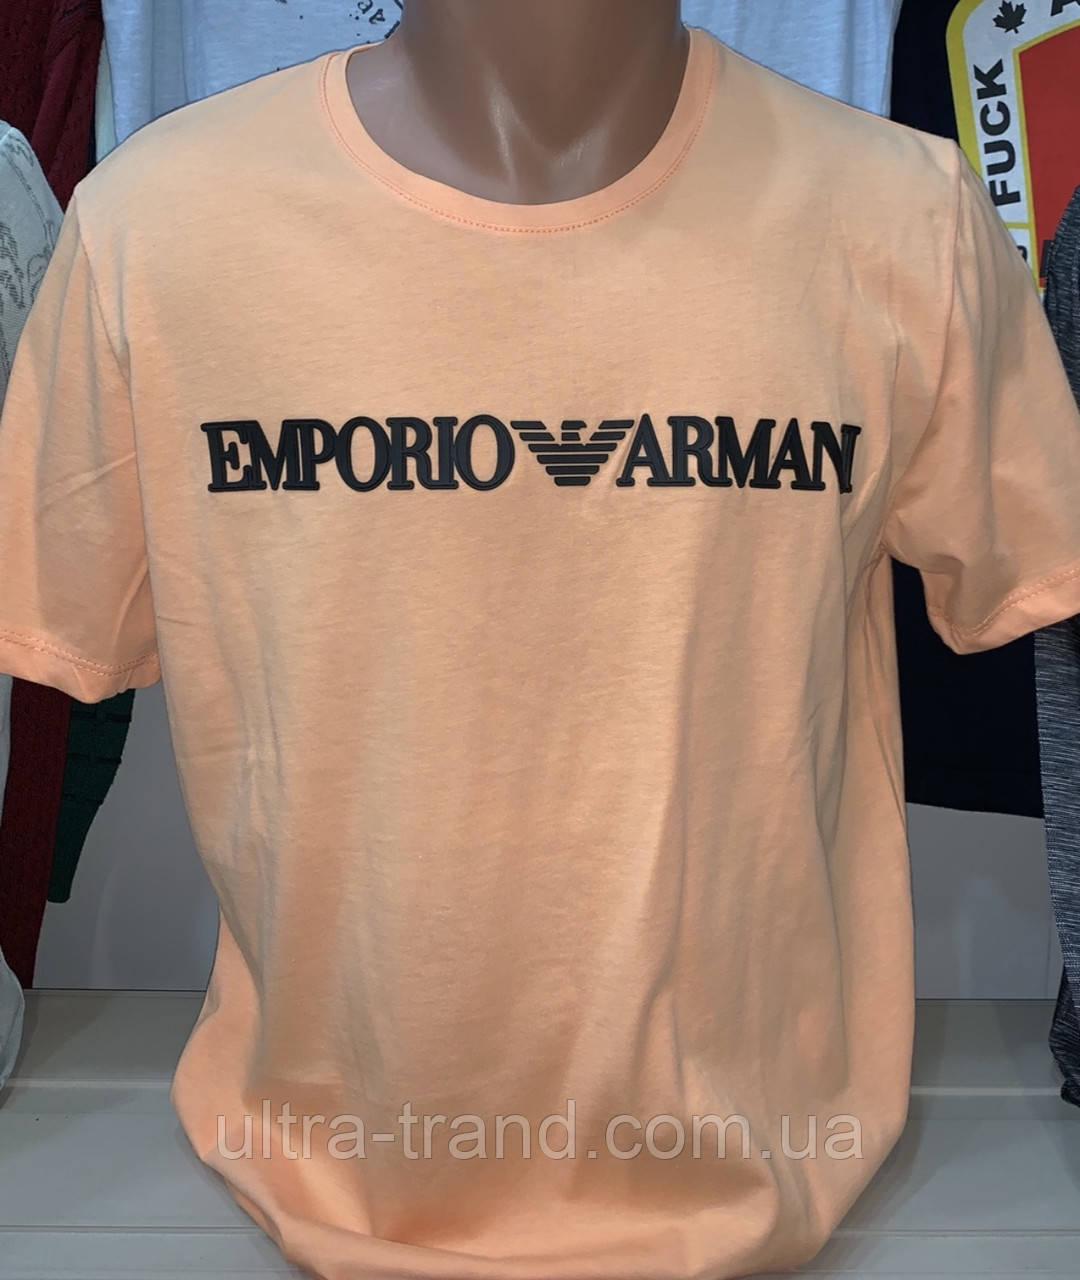 Мужская брендовая турецкая футболка Armani